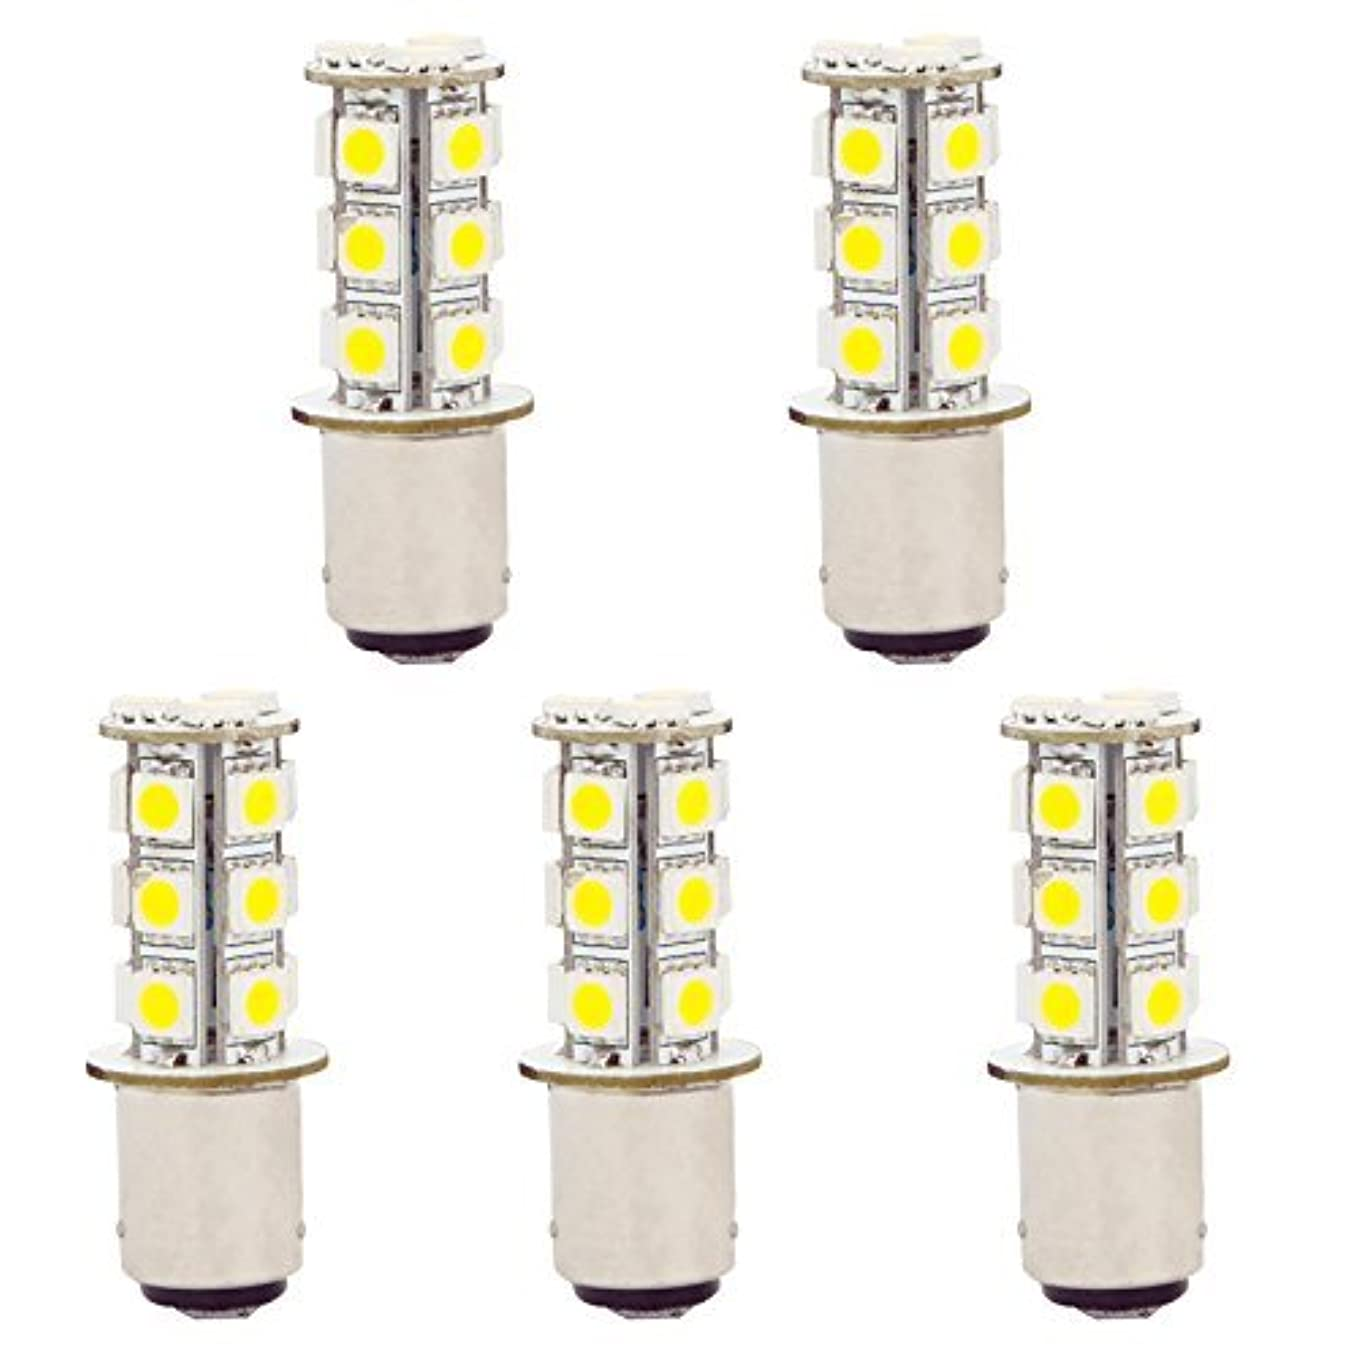 HERO-LED 1142-18T-CW Marine/Boat/RV Lights, LED Navigation Light Replacement Bulb, #1004, Cool White, DC10-30V, 5-Pack